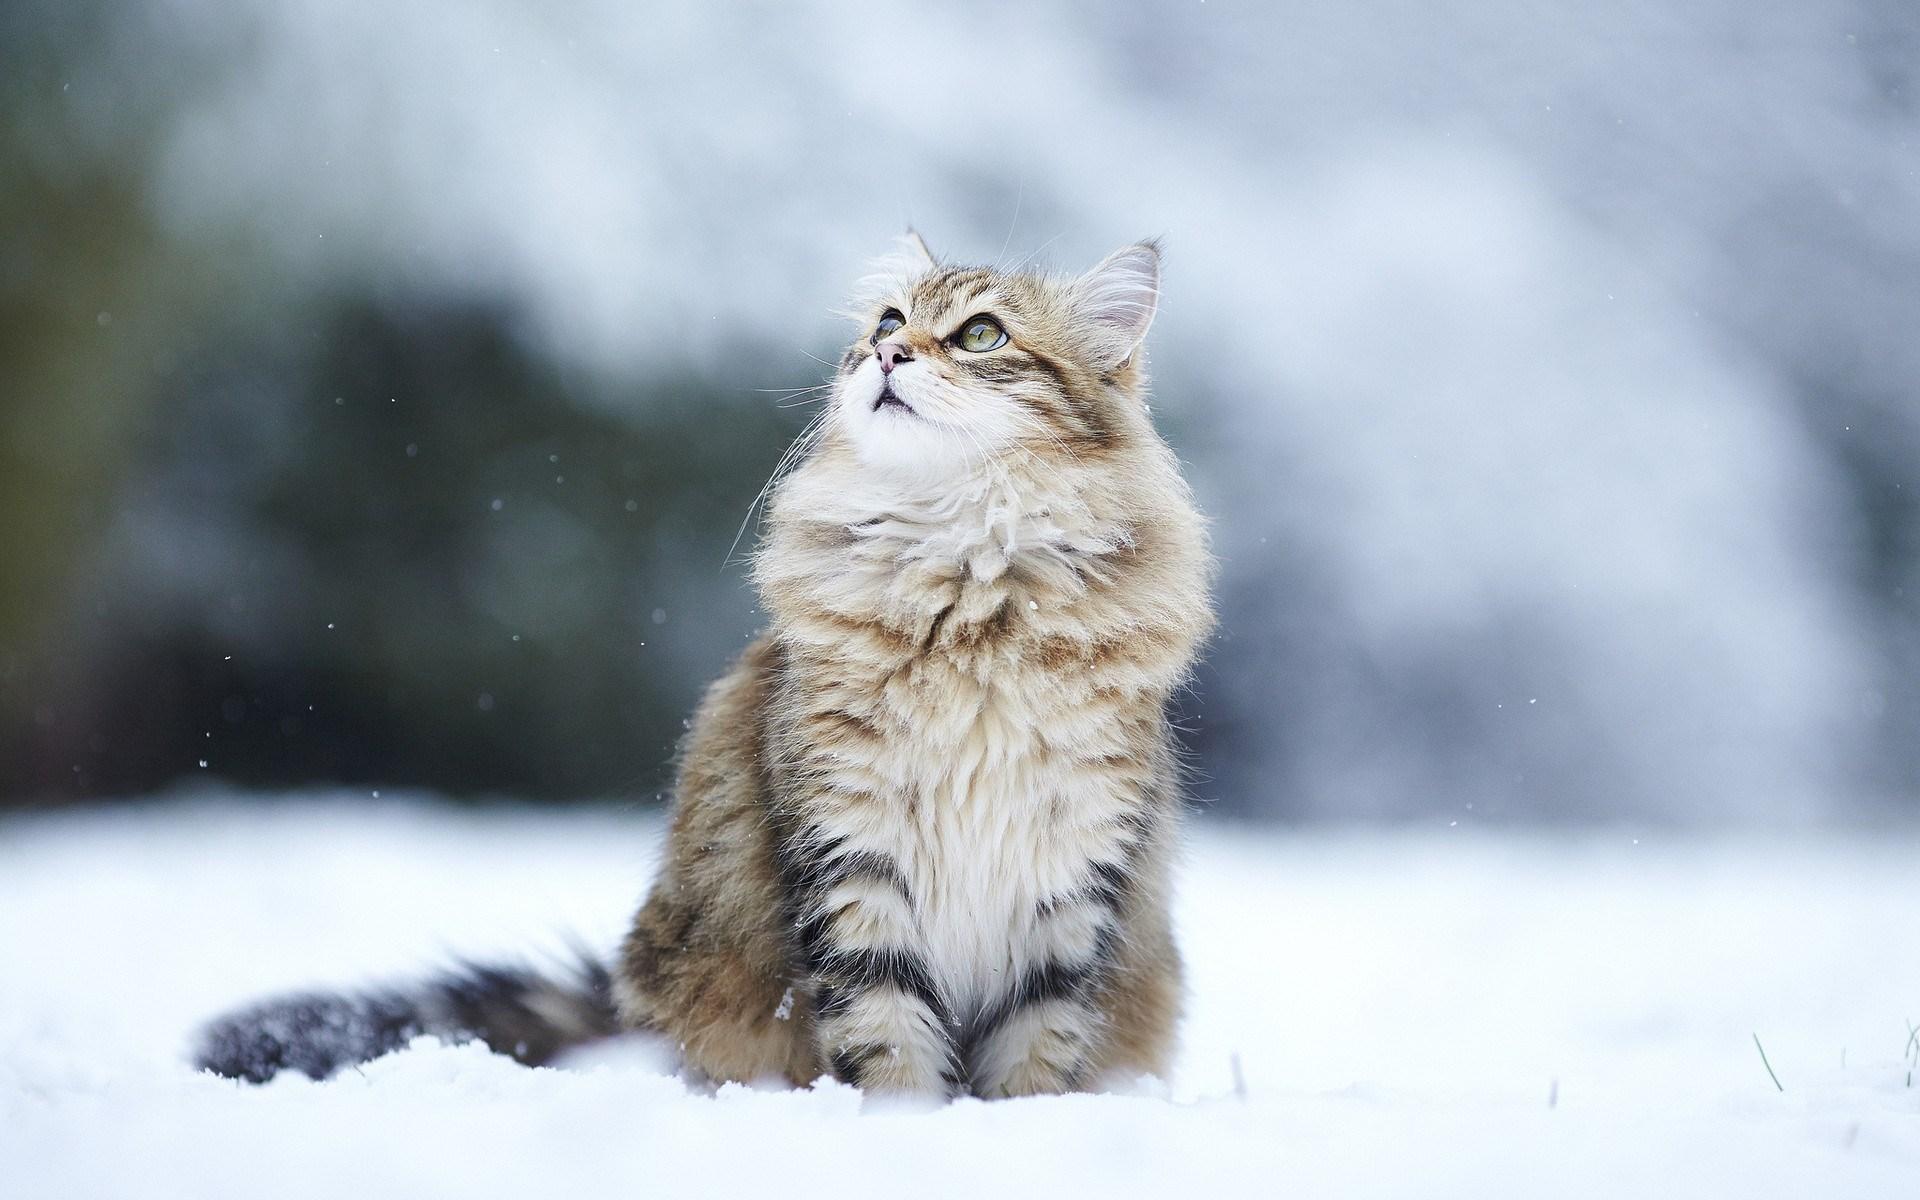 cat-hd-1080p-windows-wallpaper-wp3803665